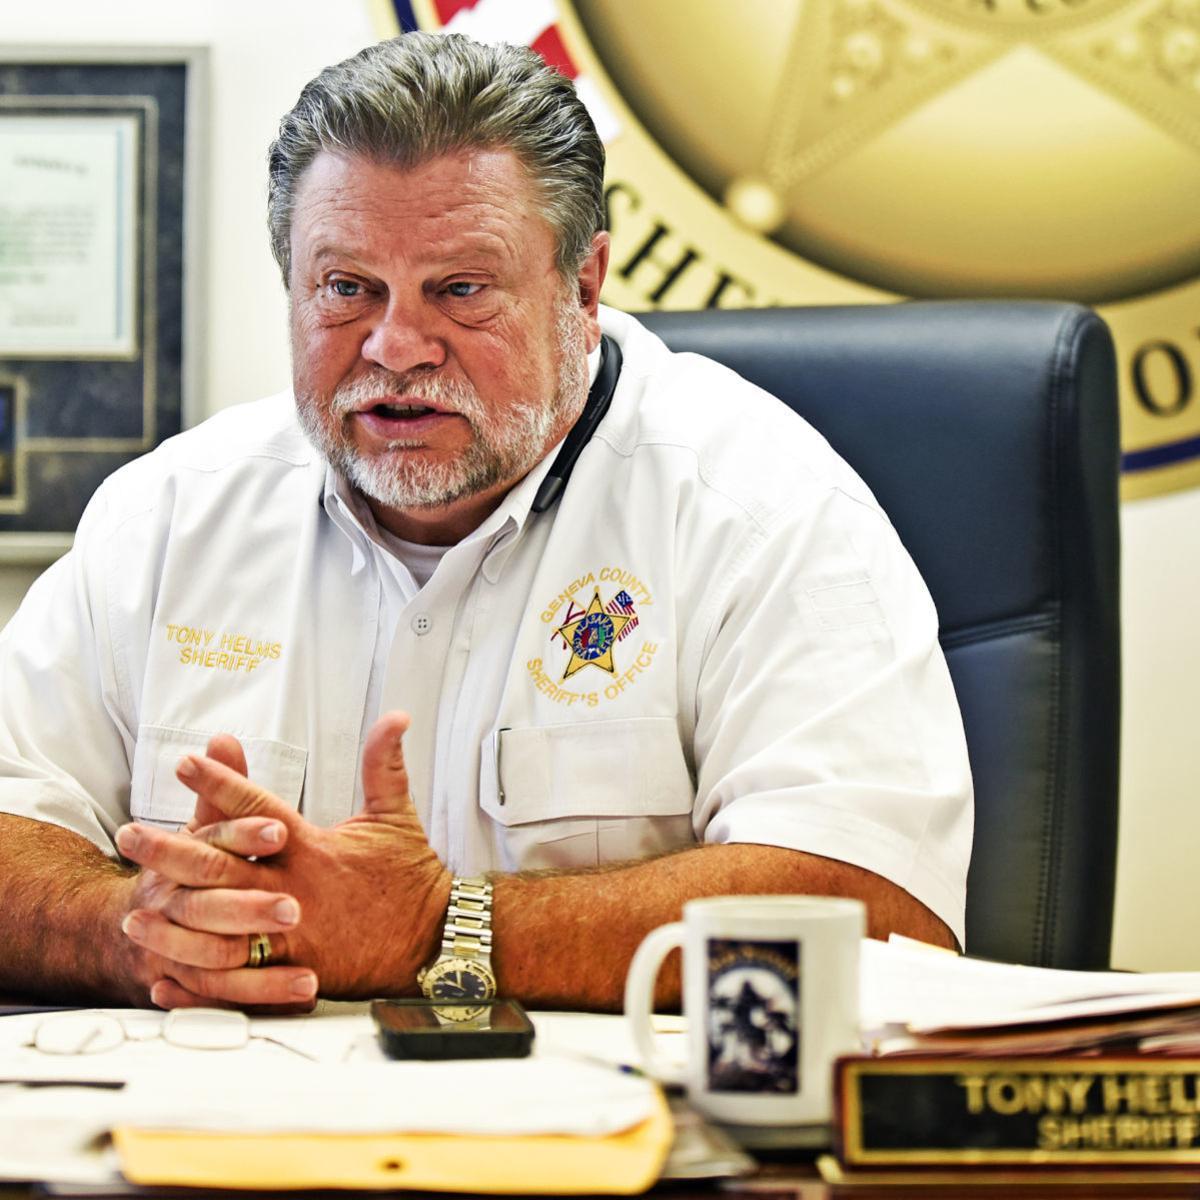 Geneva County sheriff featured in Alabama Sheriff Star